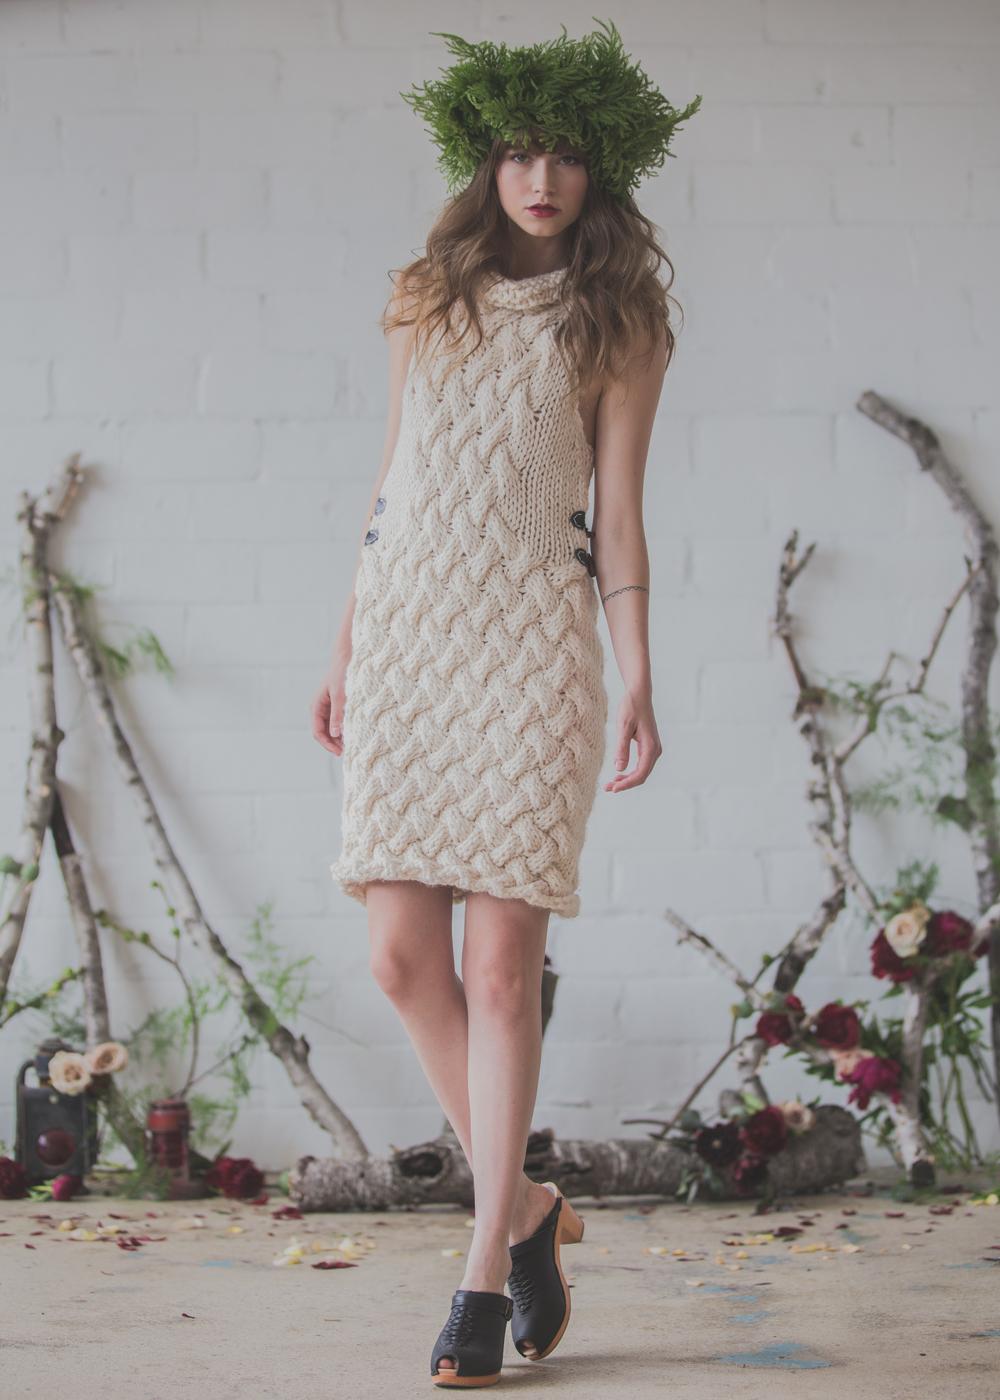 Designer: Mary Pranica